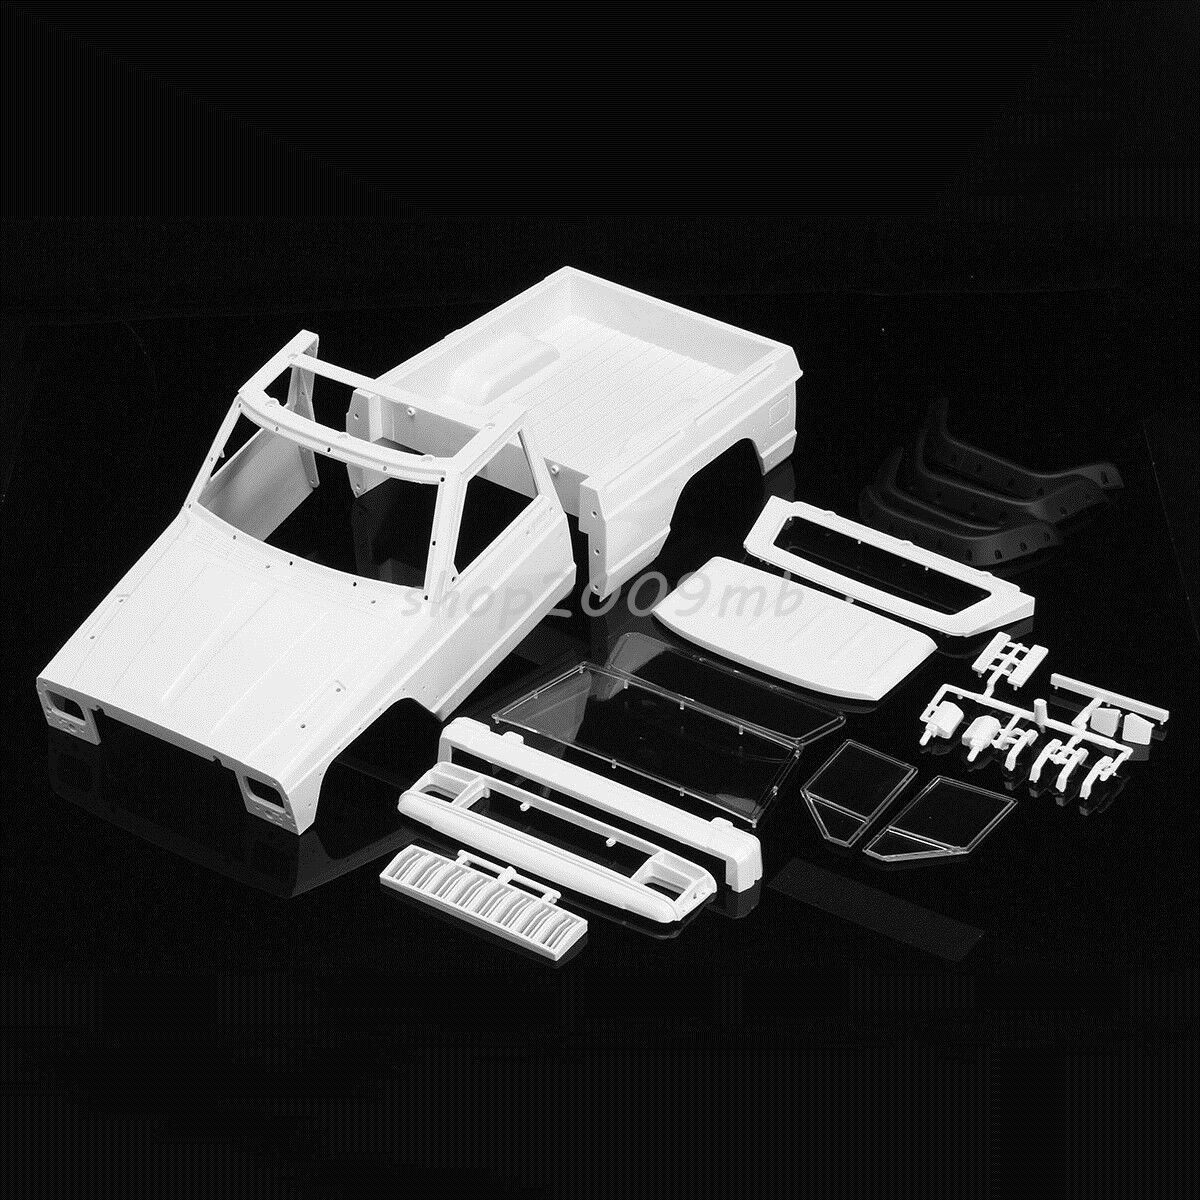 PVC duro Body Shell carrocería para SCX10 90046 1 10 rc crawler coche Bricolaje ACCS